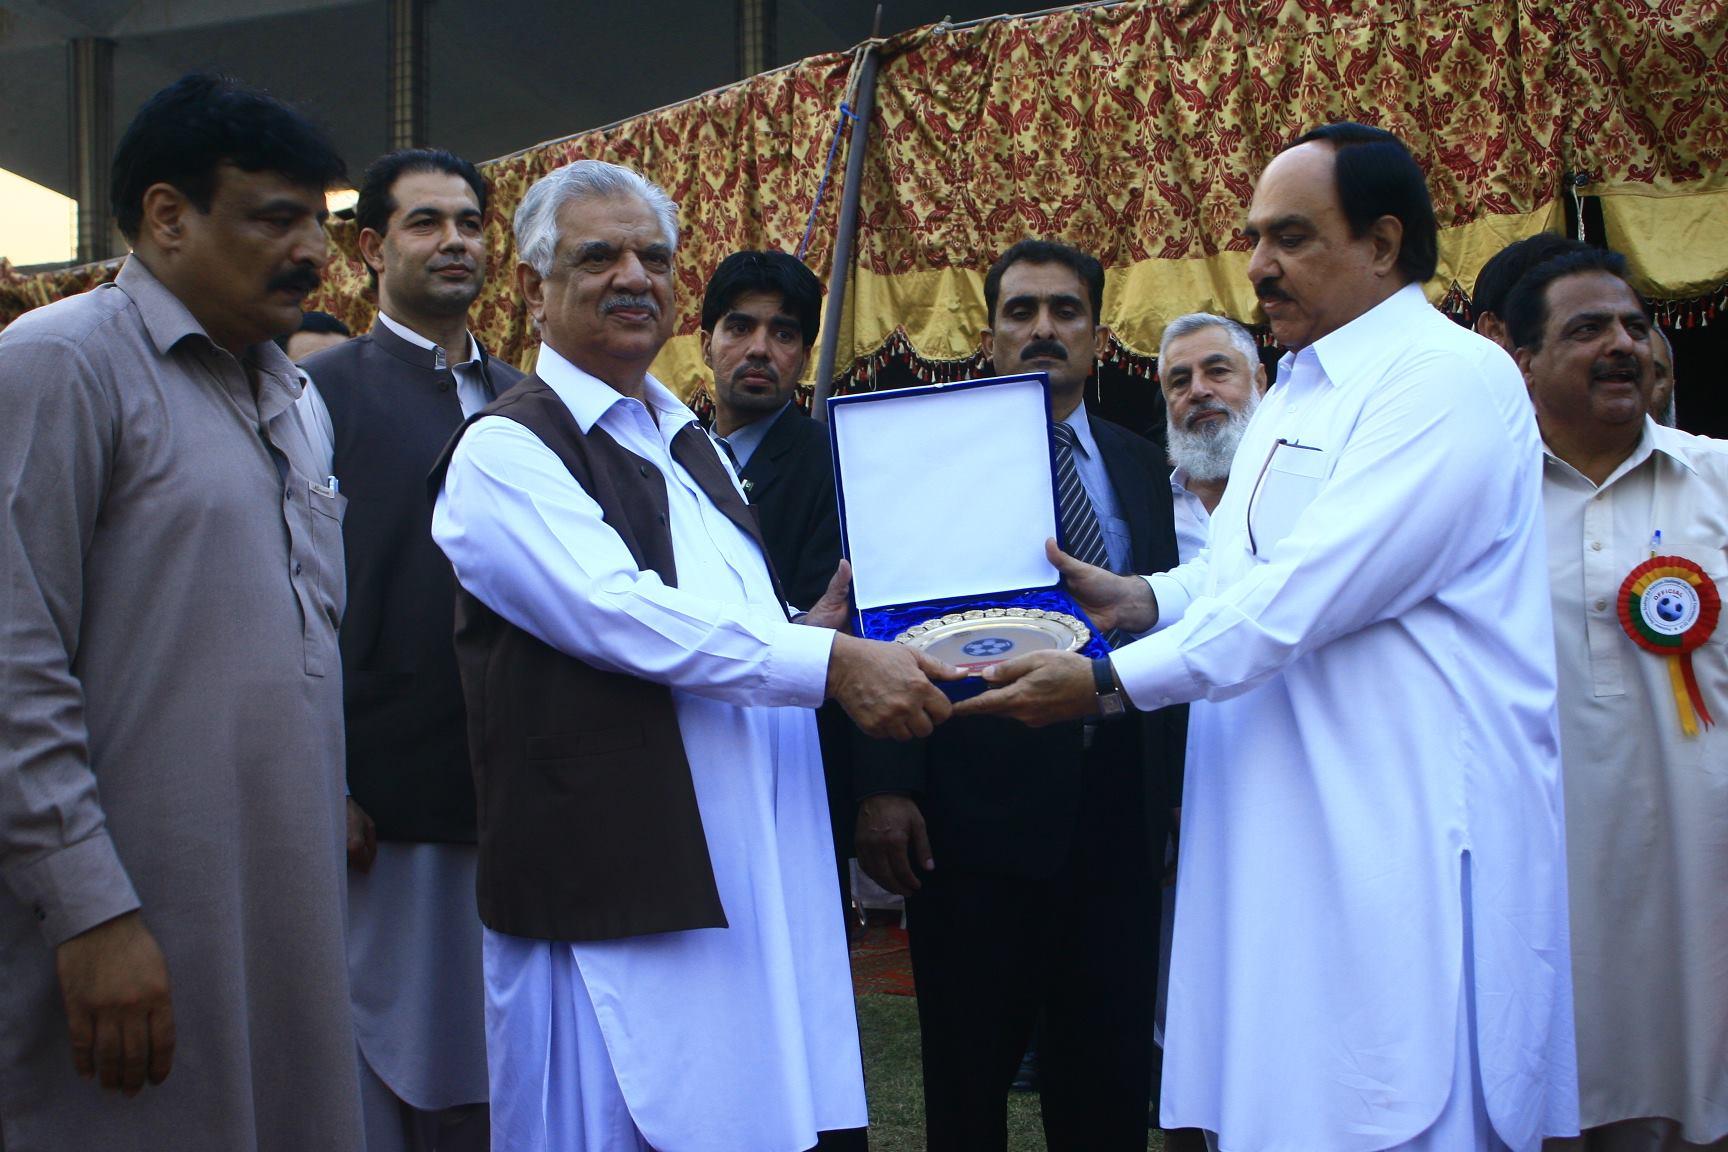 kpfa-president-syed-zahir-ali-shah-right-presenting-memento-to-governor-kpk-engr-iqbal-jhagra